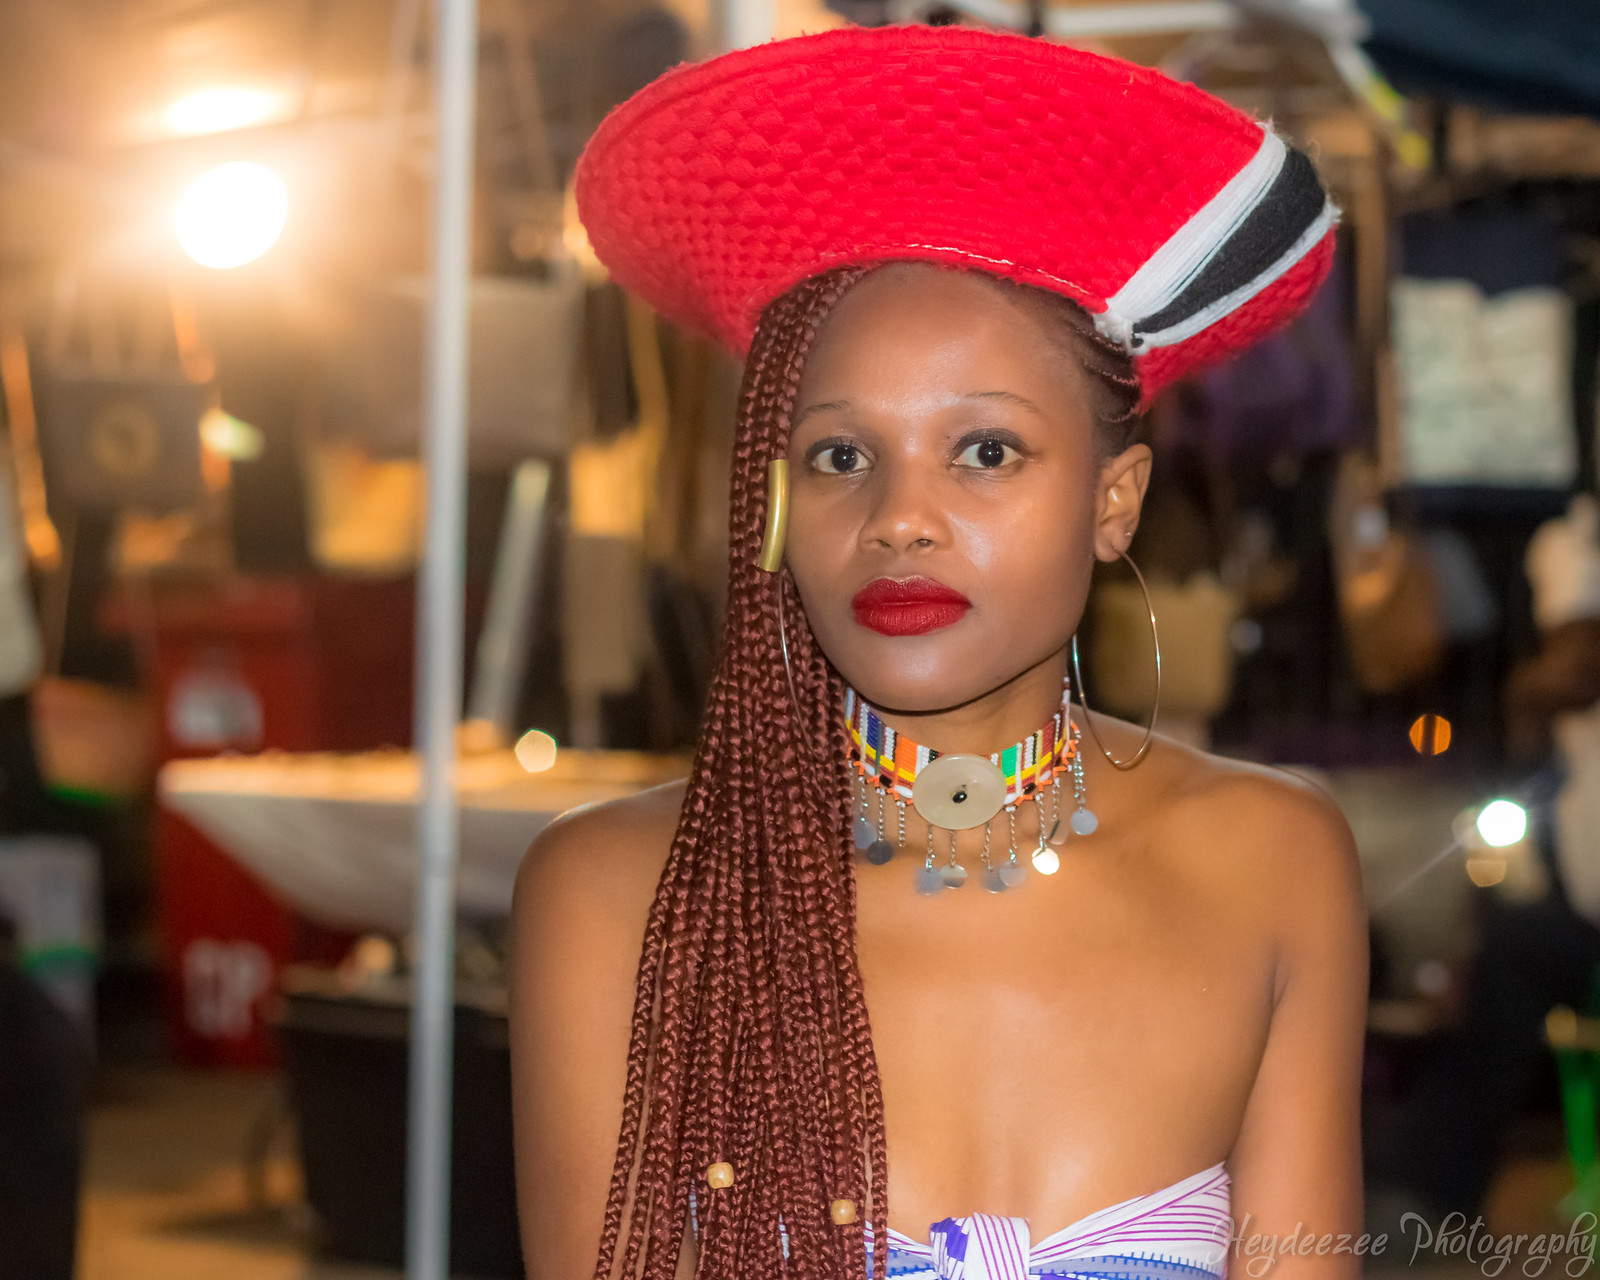 #afropunk #afropunkjoburg #afropunkfest #afropunkers #beauty #portraitfestival #portraitphotography#portrait #eventphotography